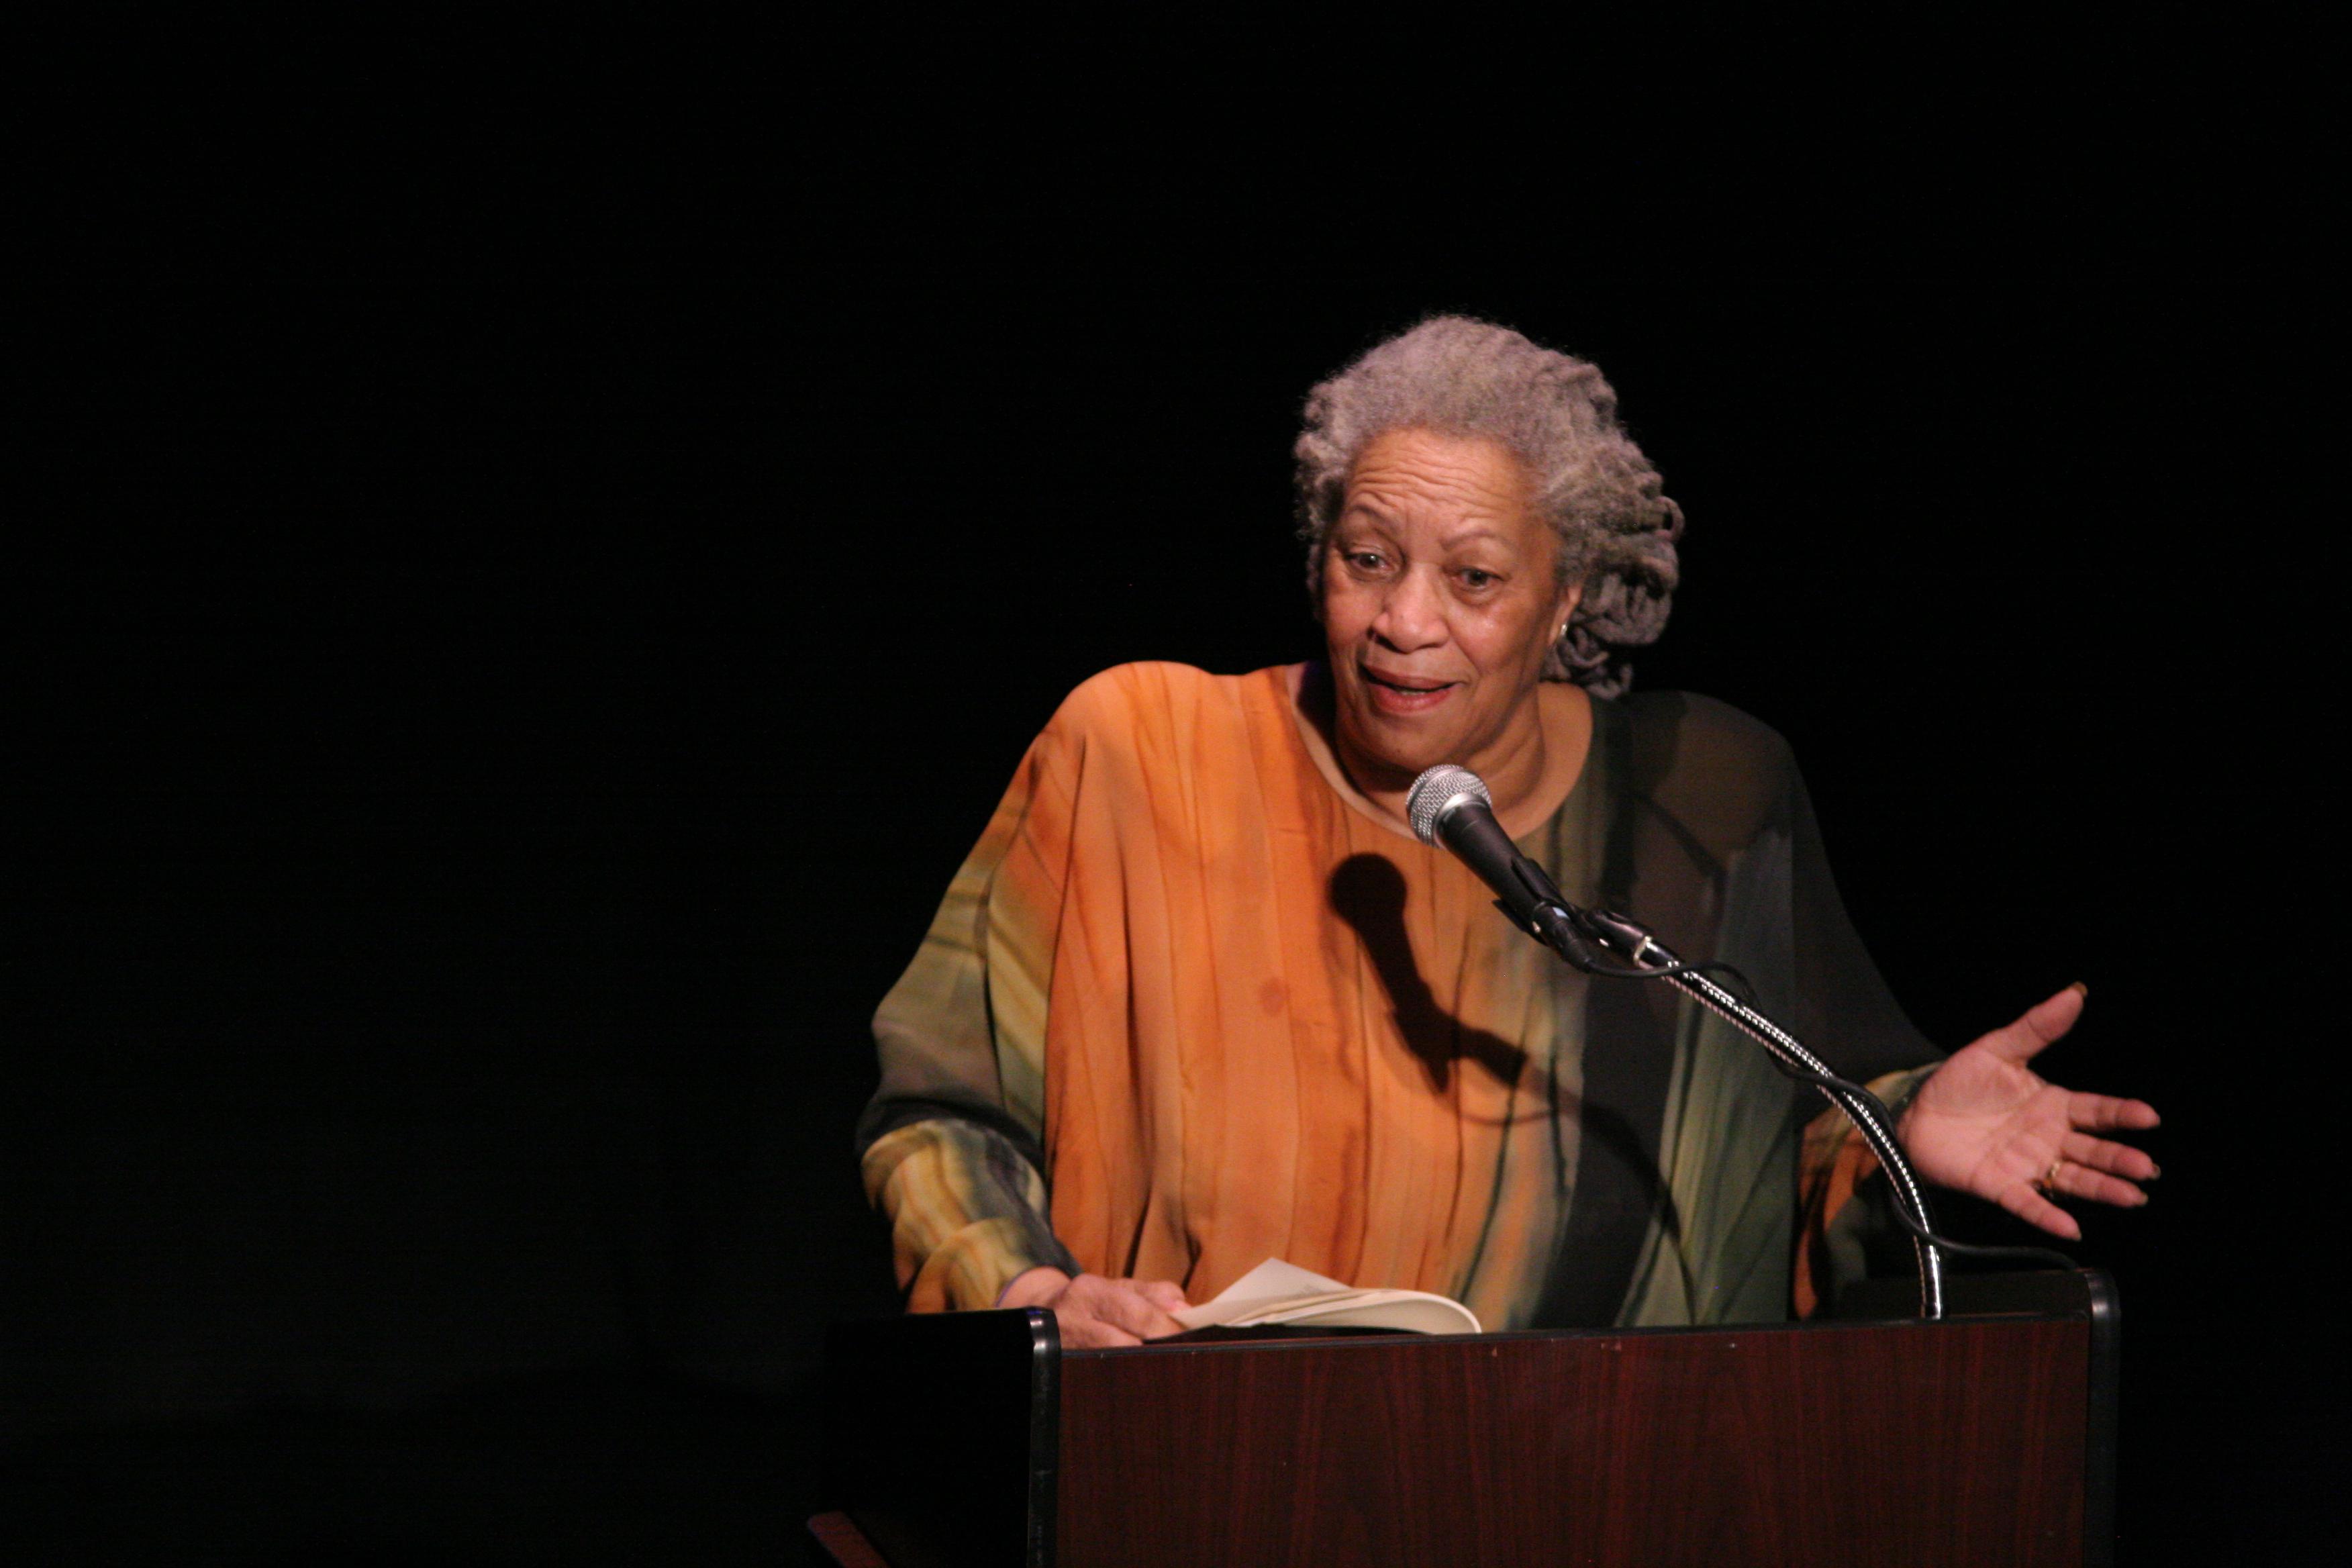 In Enlightening Conversation, Junot Díaz & Toni Morrison Discuss Writing About the Black Diaspora